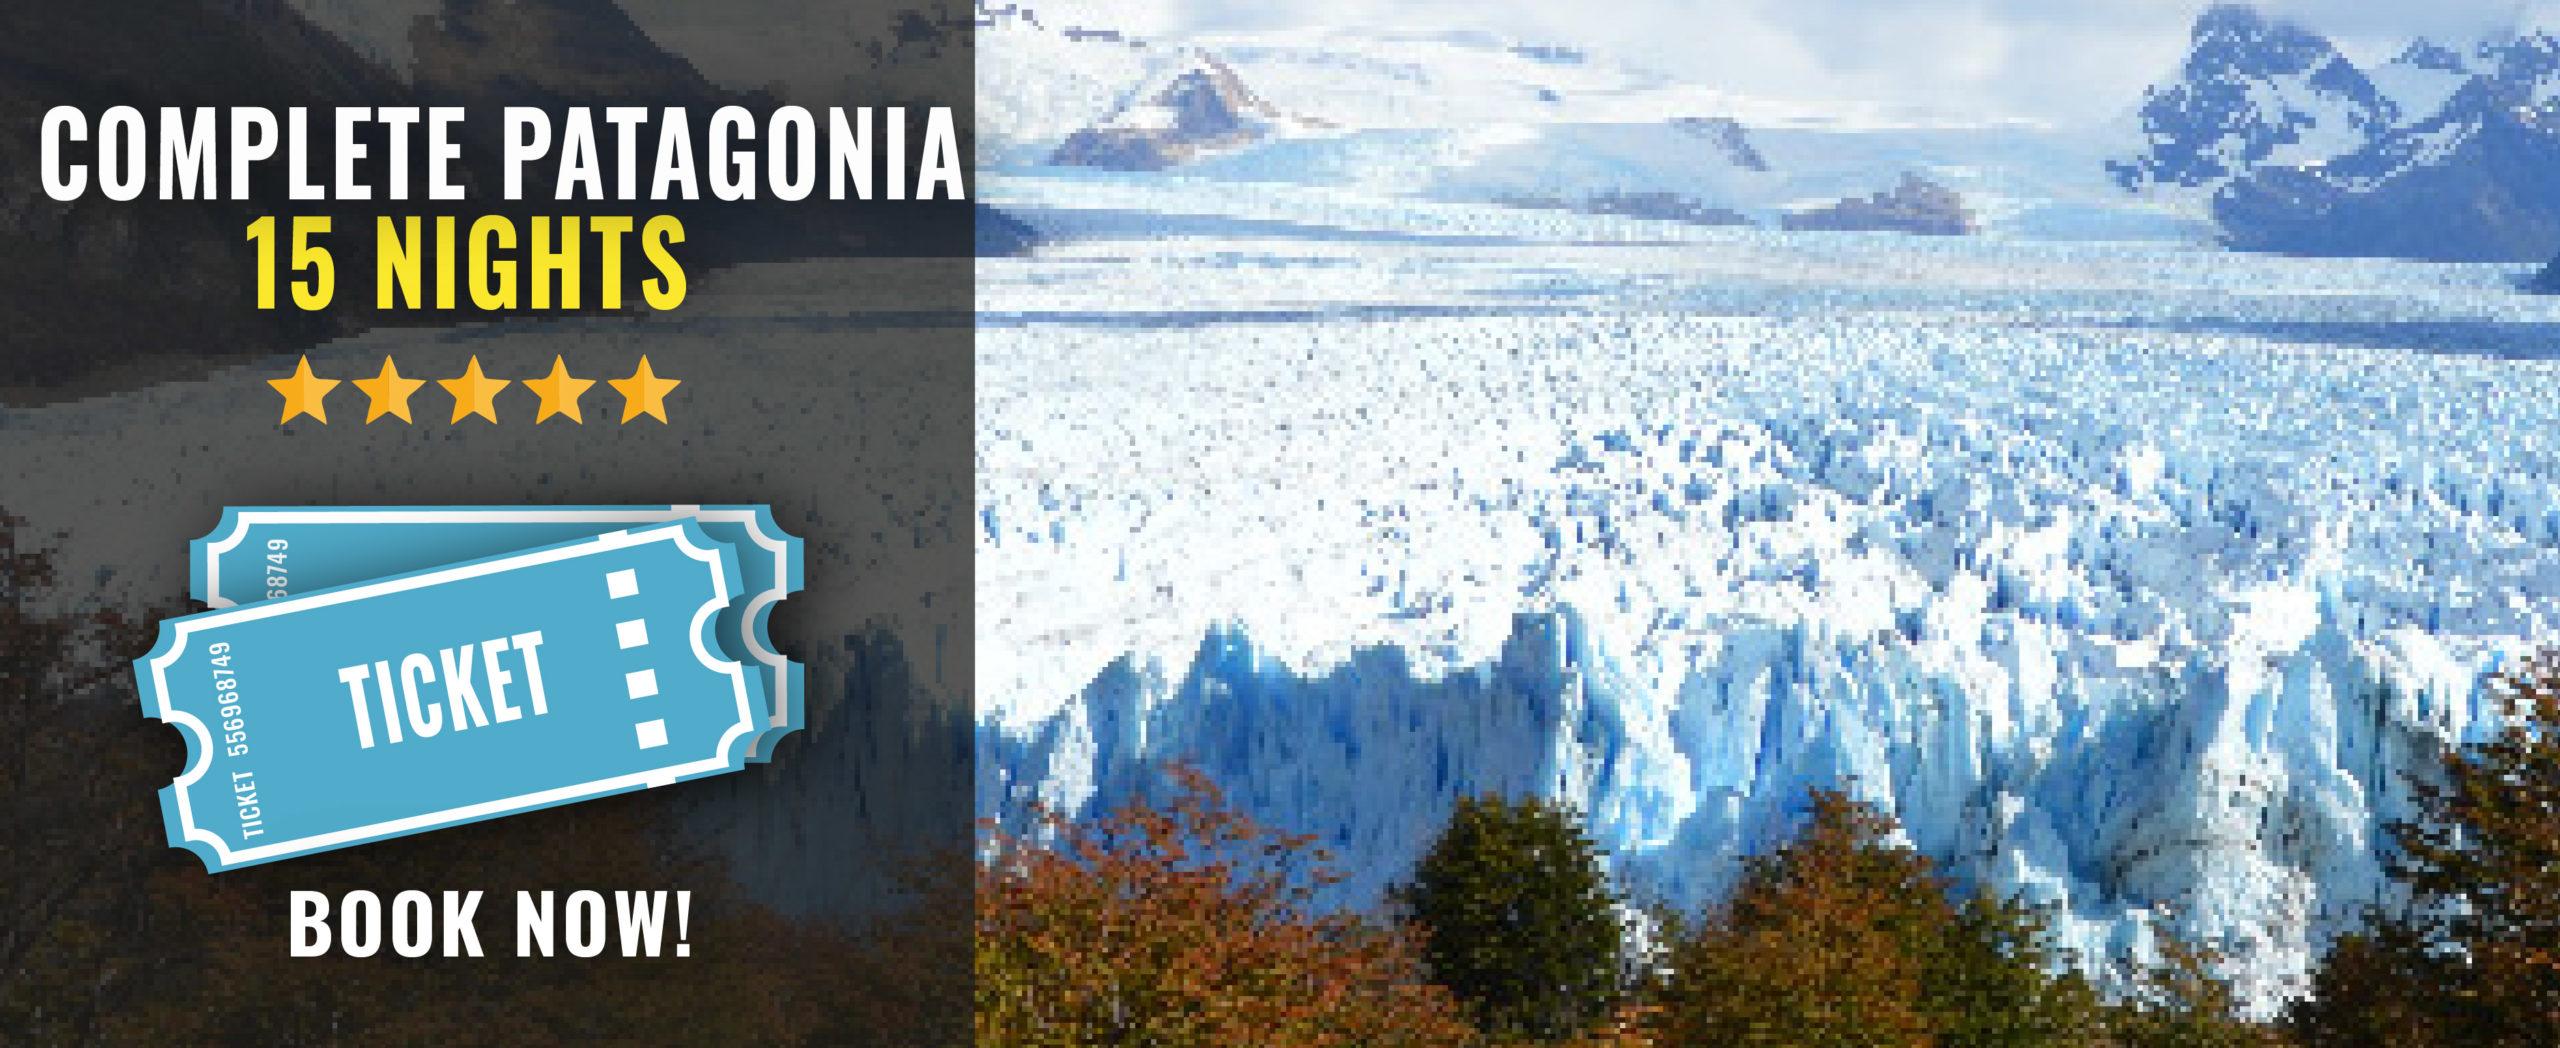 complete patagonia tour in Argentina